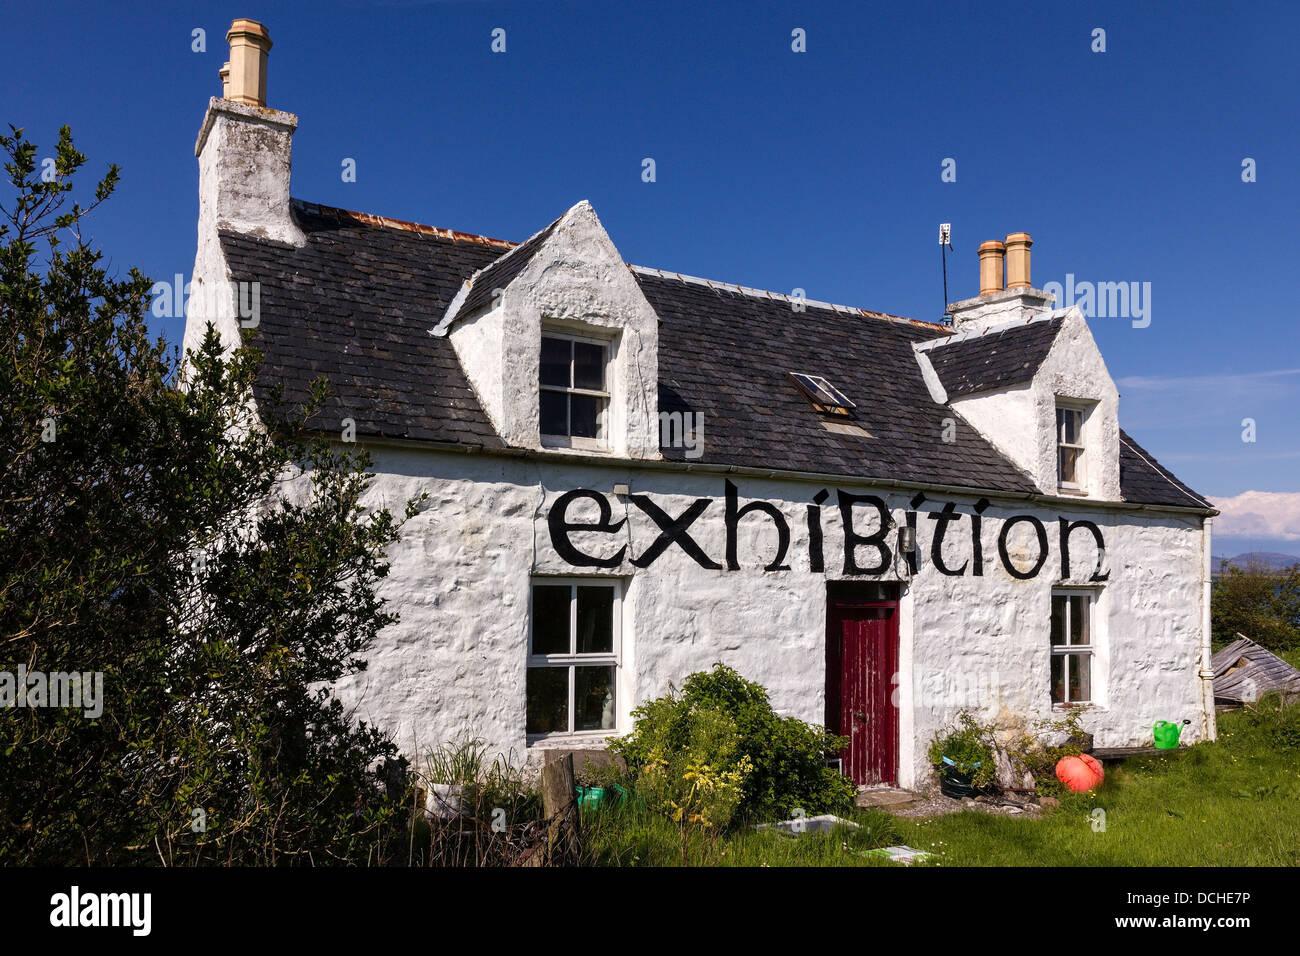 Old white painted 'exhibition' croft cottage against blue sky, Broadford, Isle of Skye, Scotland, UK - Stock Image